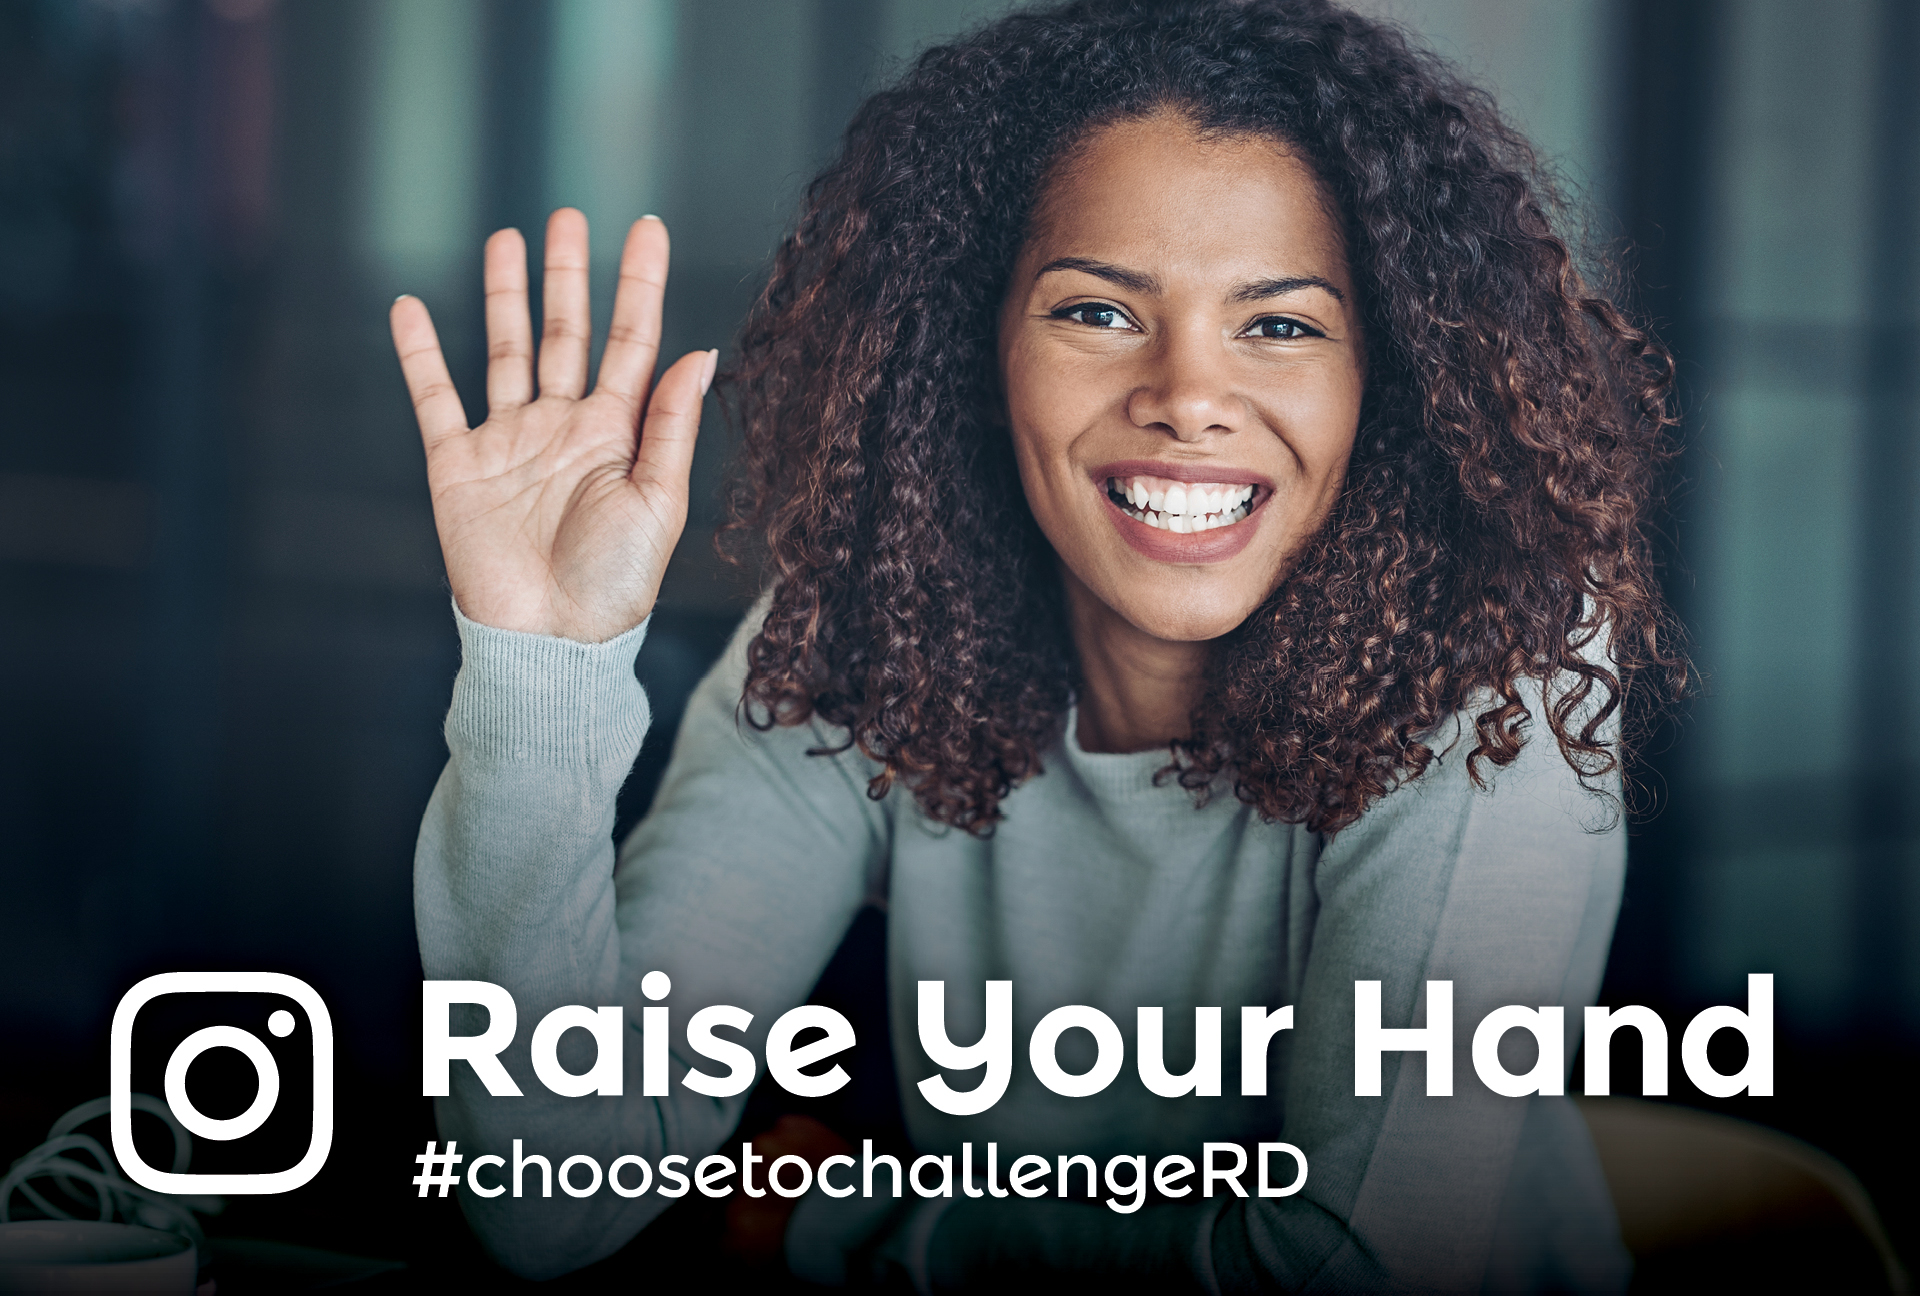 Raise Your Hand #choosetochallengeRD